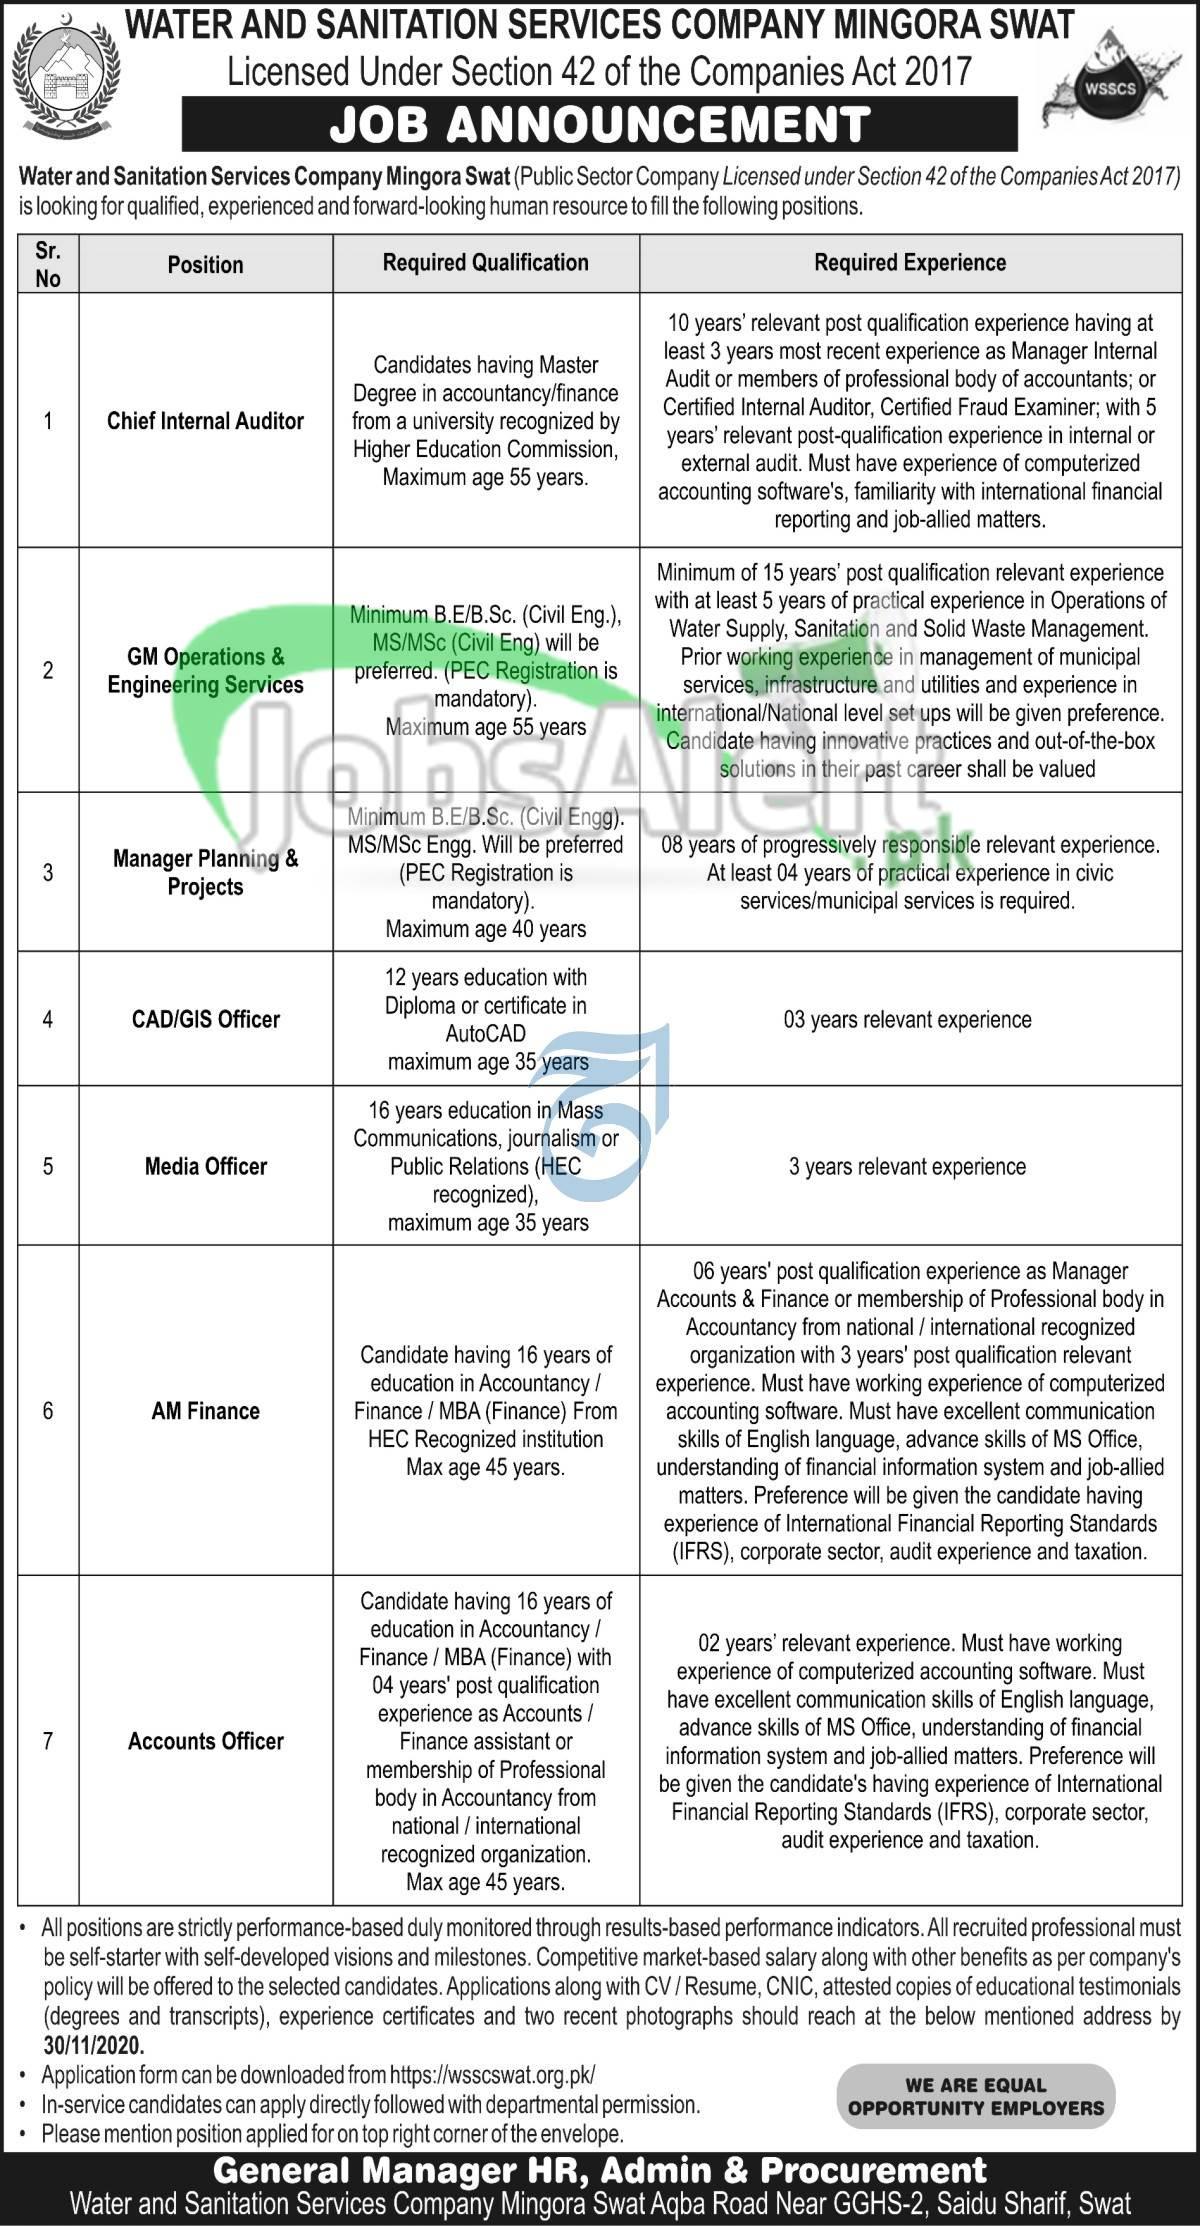 WSSC Mingora Swat Jobs